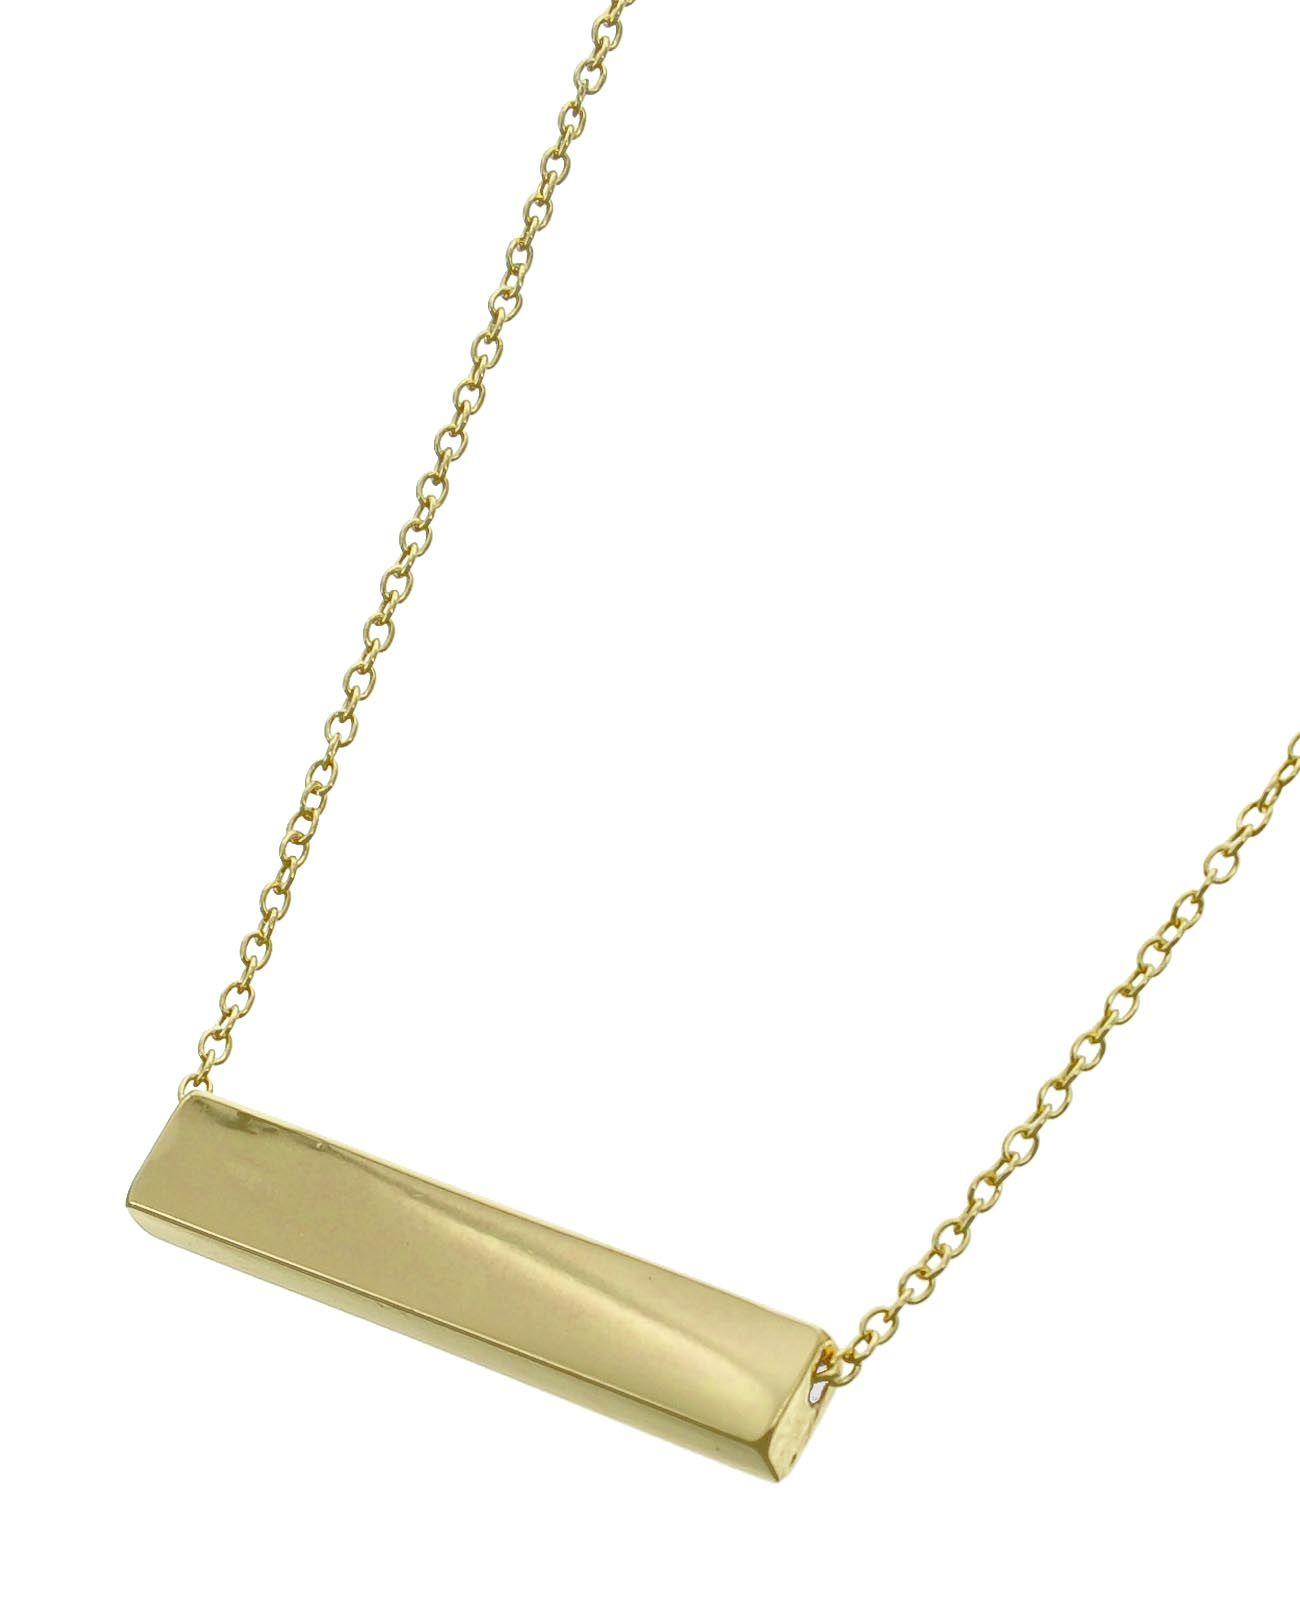 Gold Tone / Lead&nickel Compliant / Metal / Delicate / Necklace